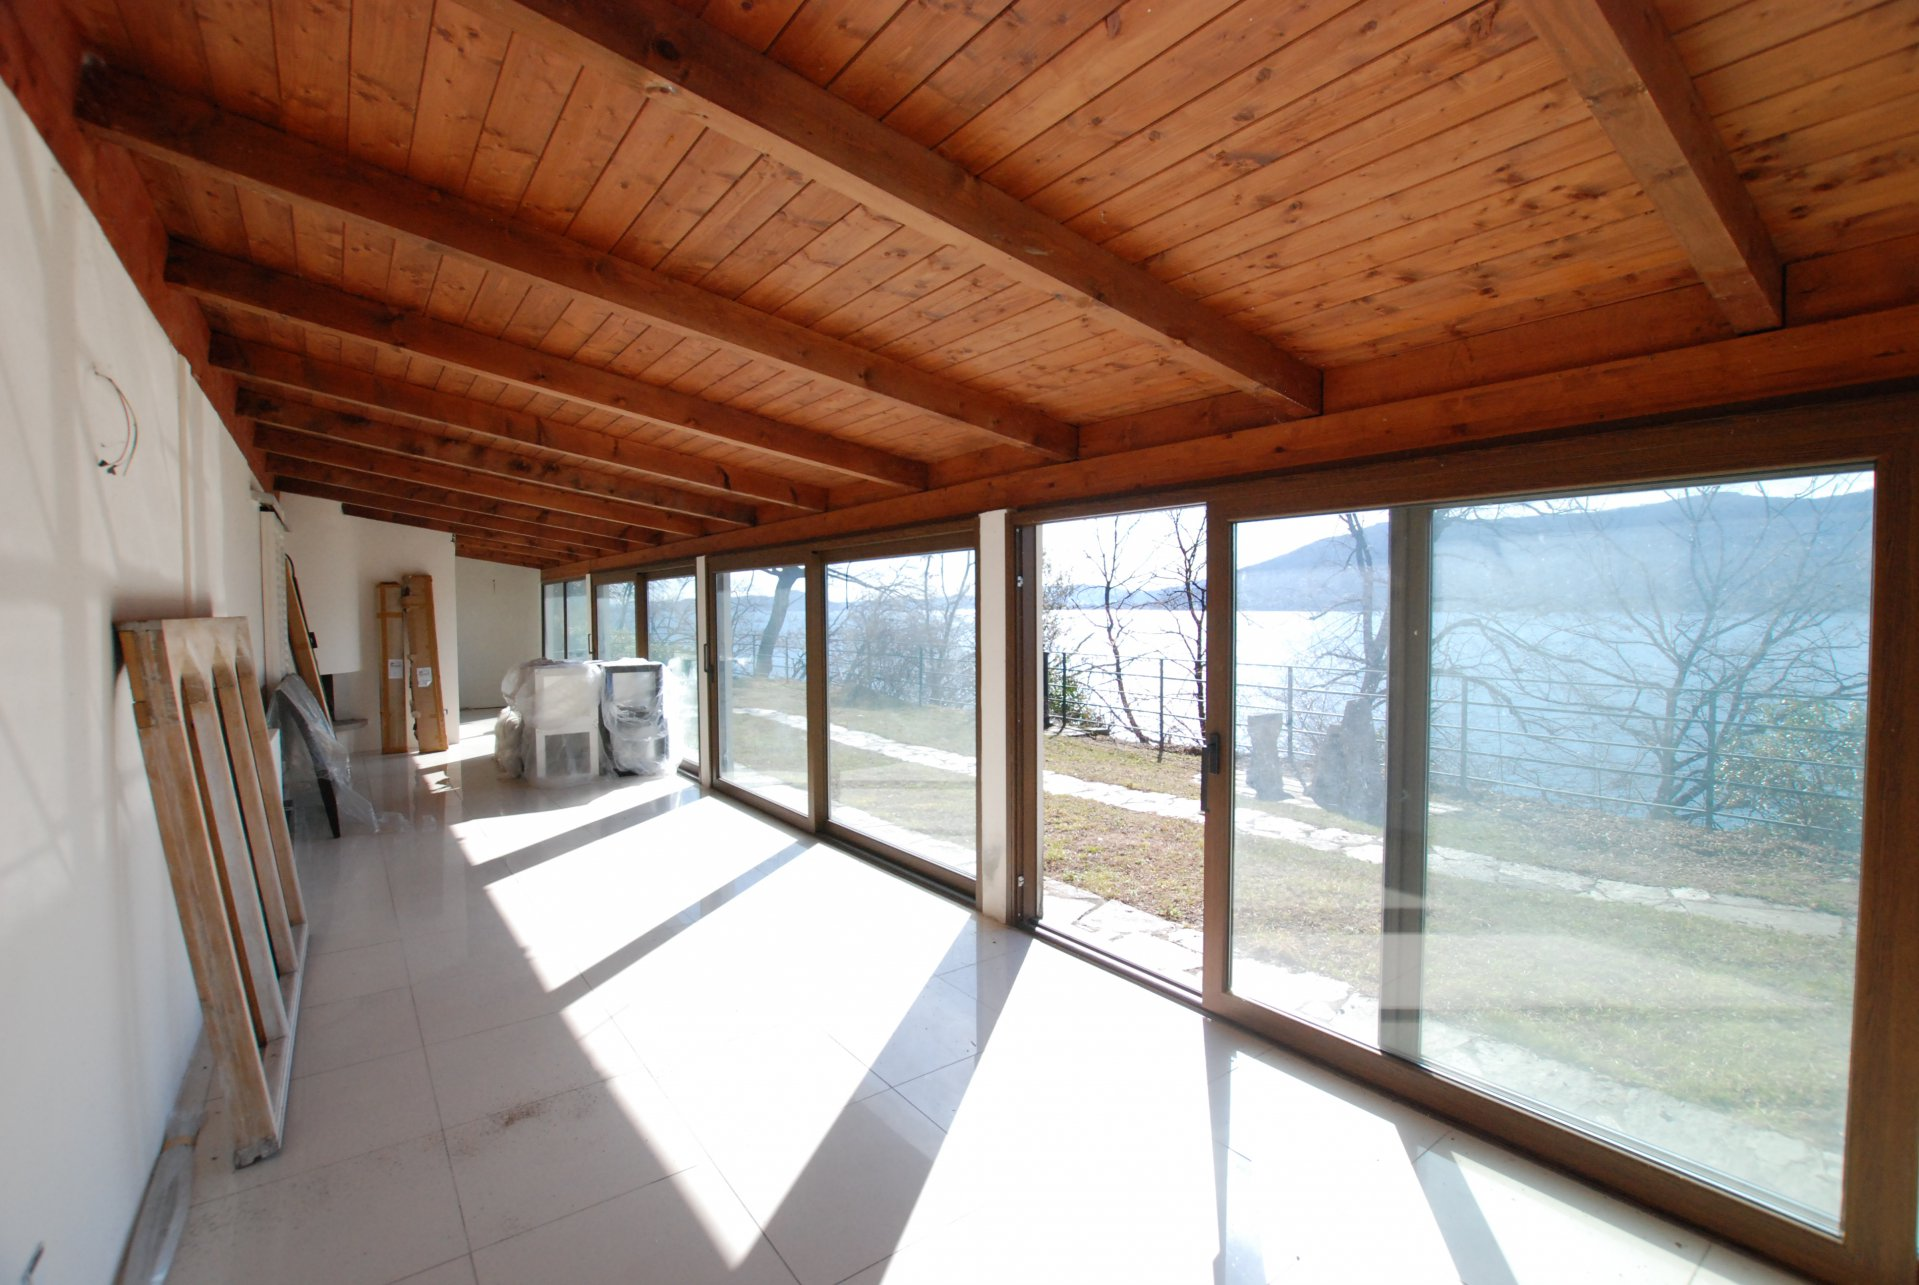 Lake front property for sale in Leggiuno